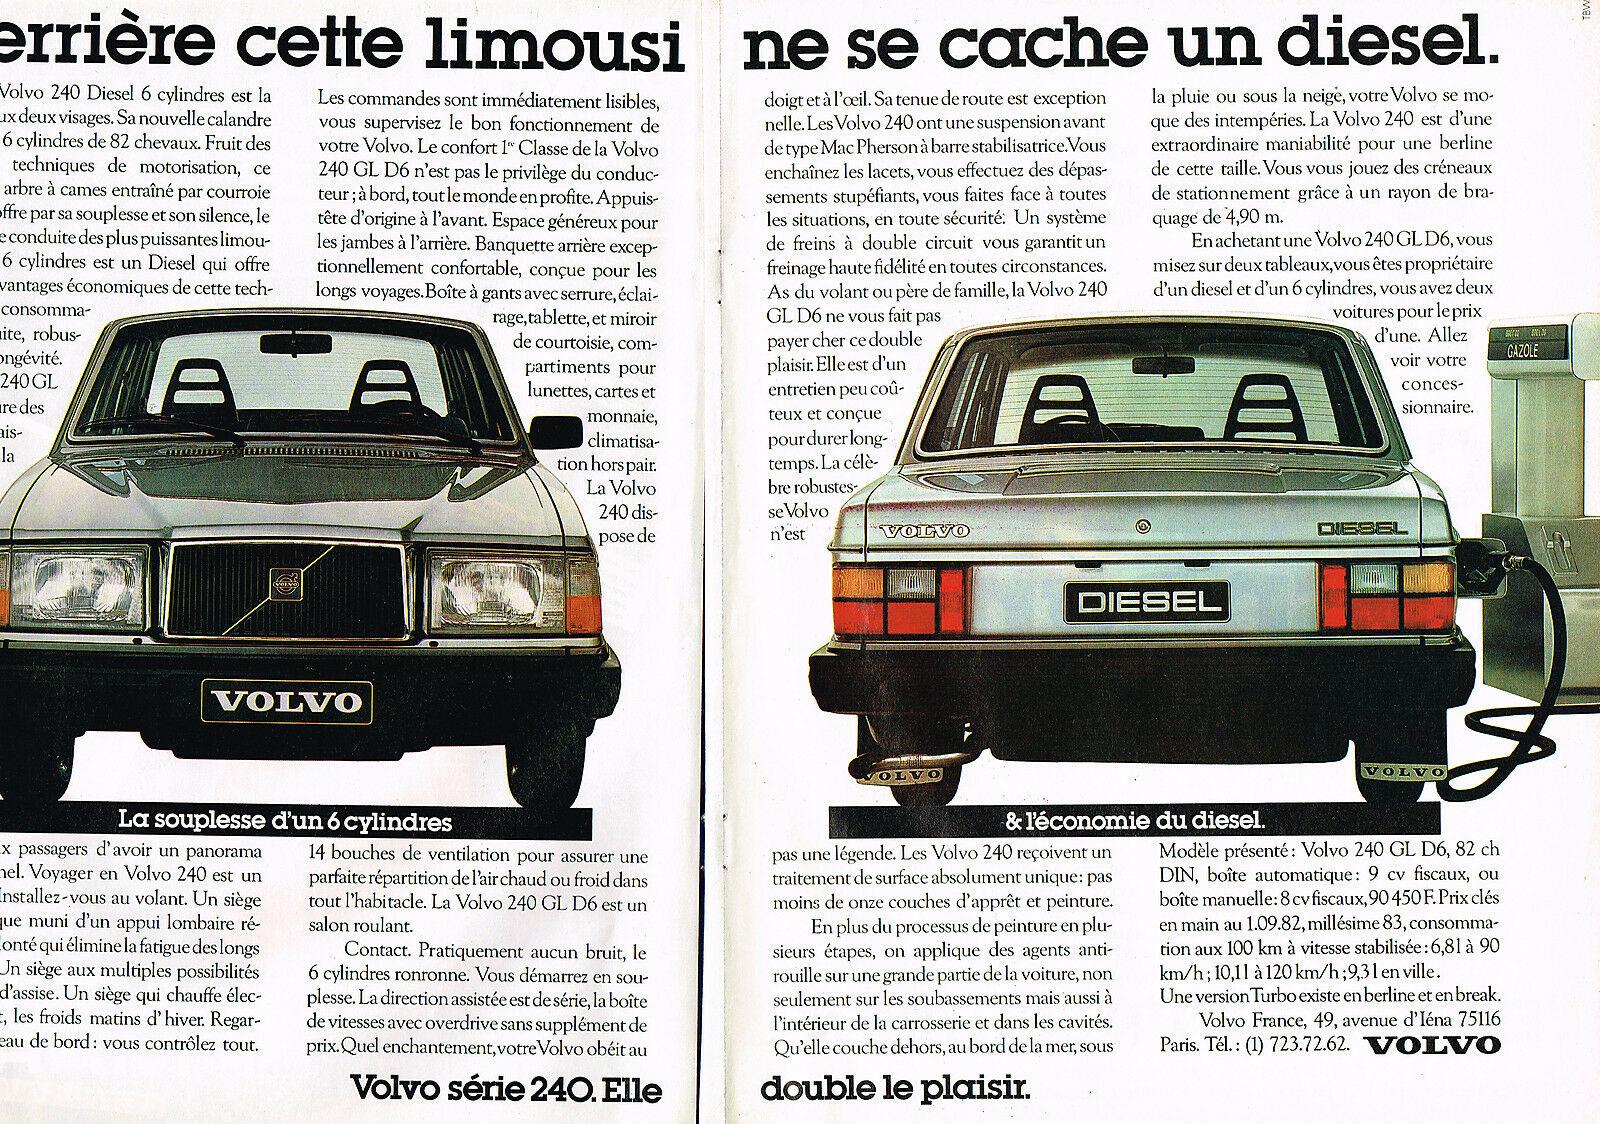 1982 VOLVO 240 GL D6